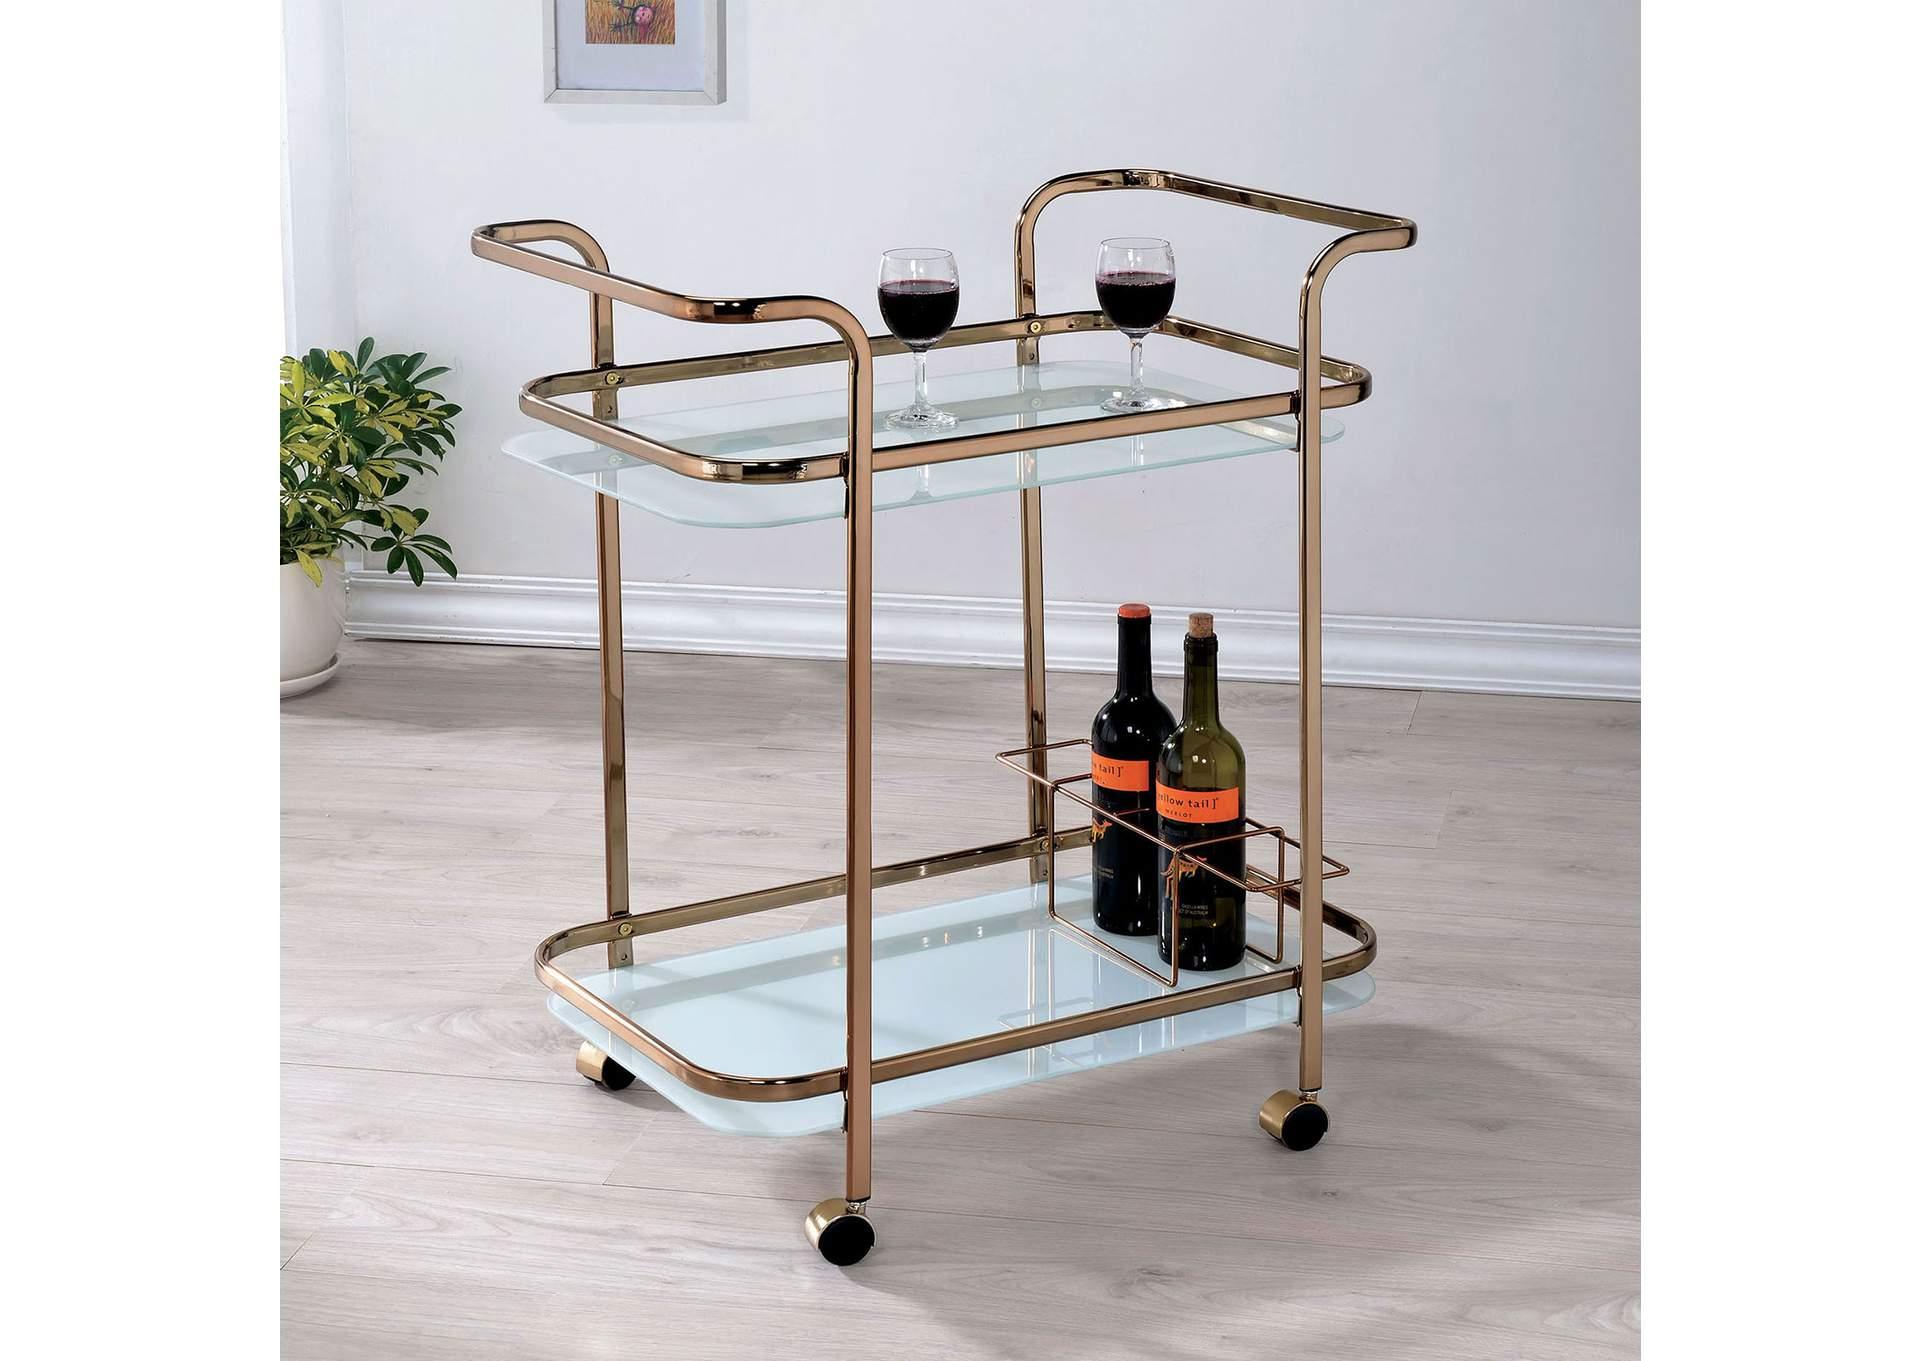 Squan Furniture Tiana Champagne Serving Cart : CM AC235 from www.squanfurniture.com size 1050 x 744 jpeg 131kB